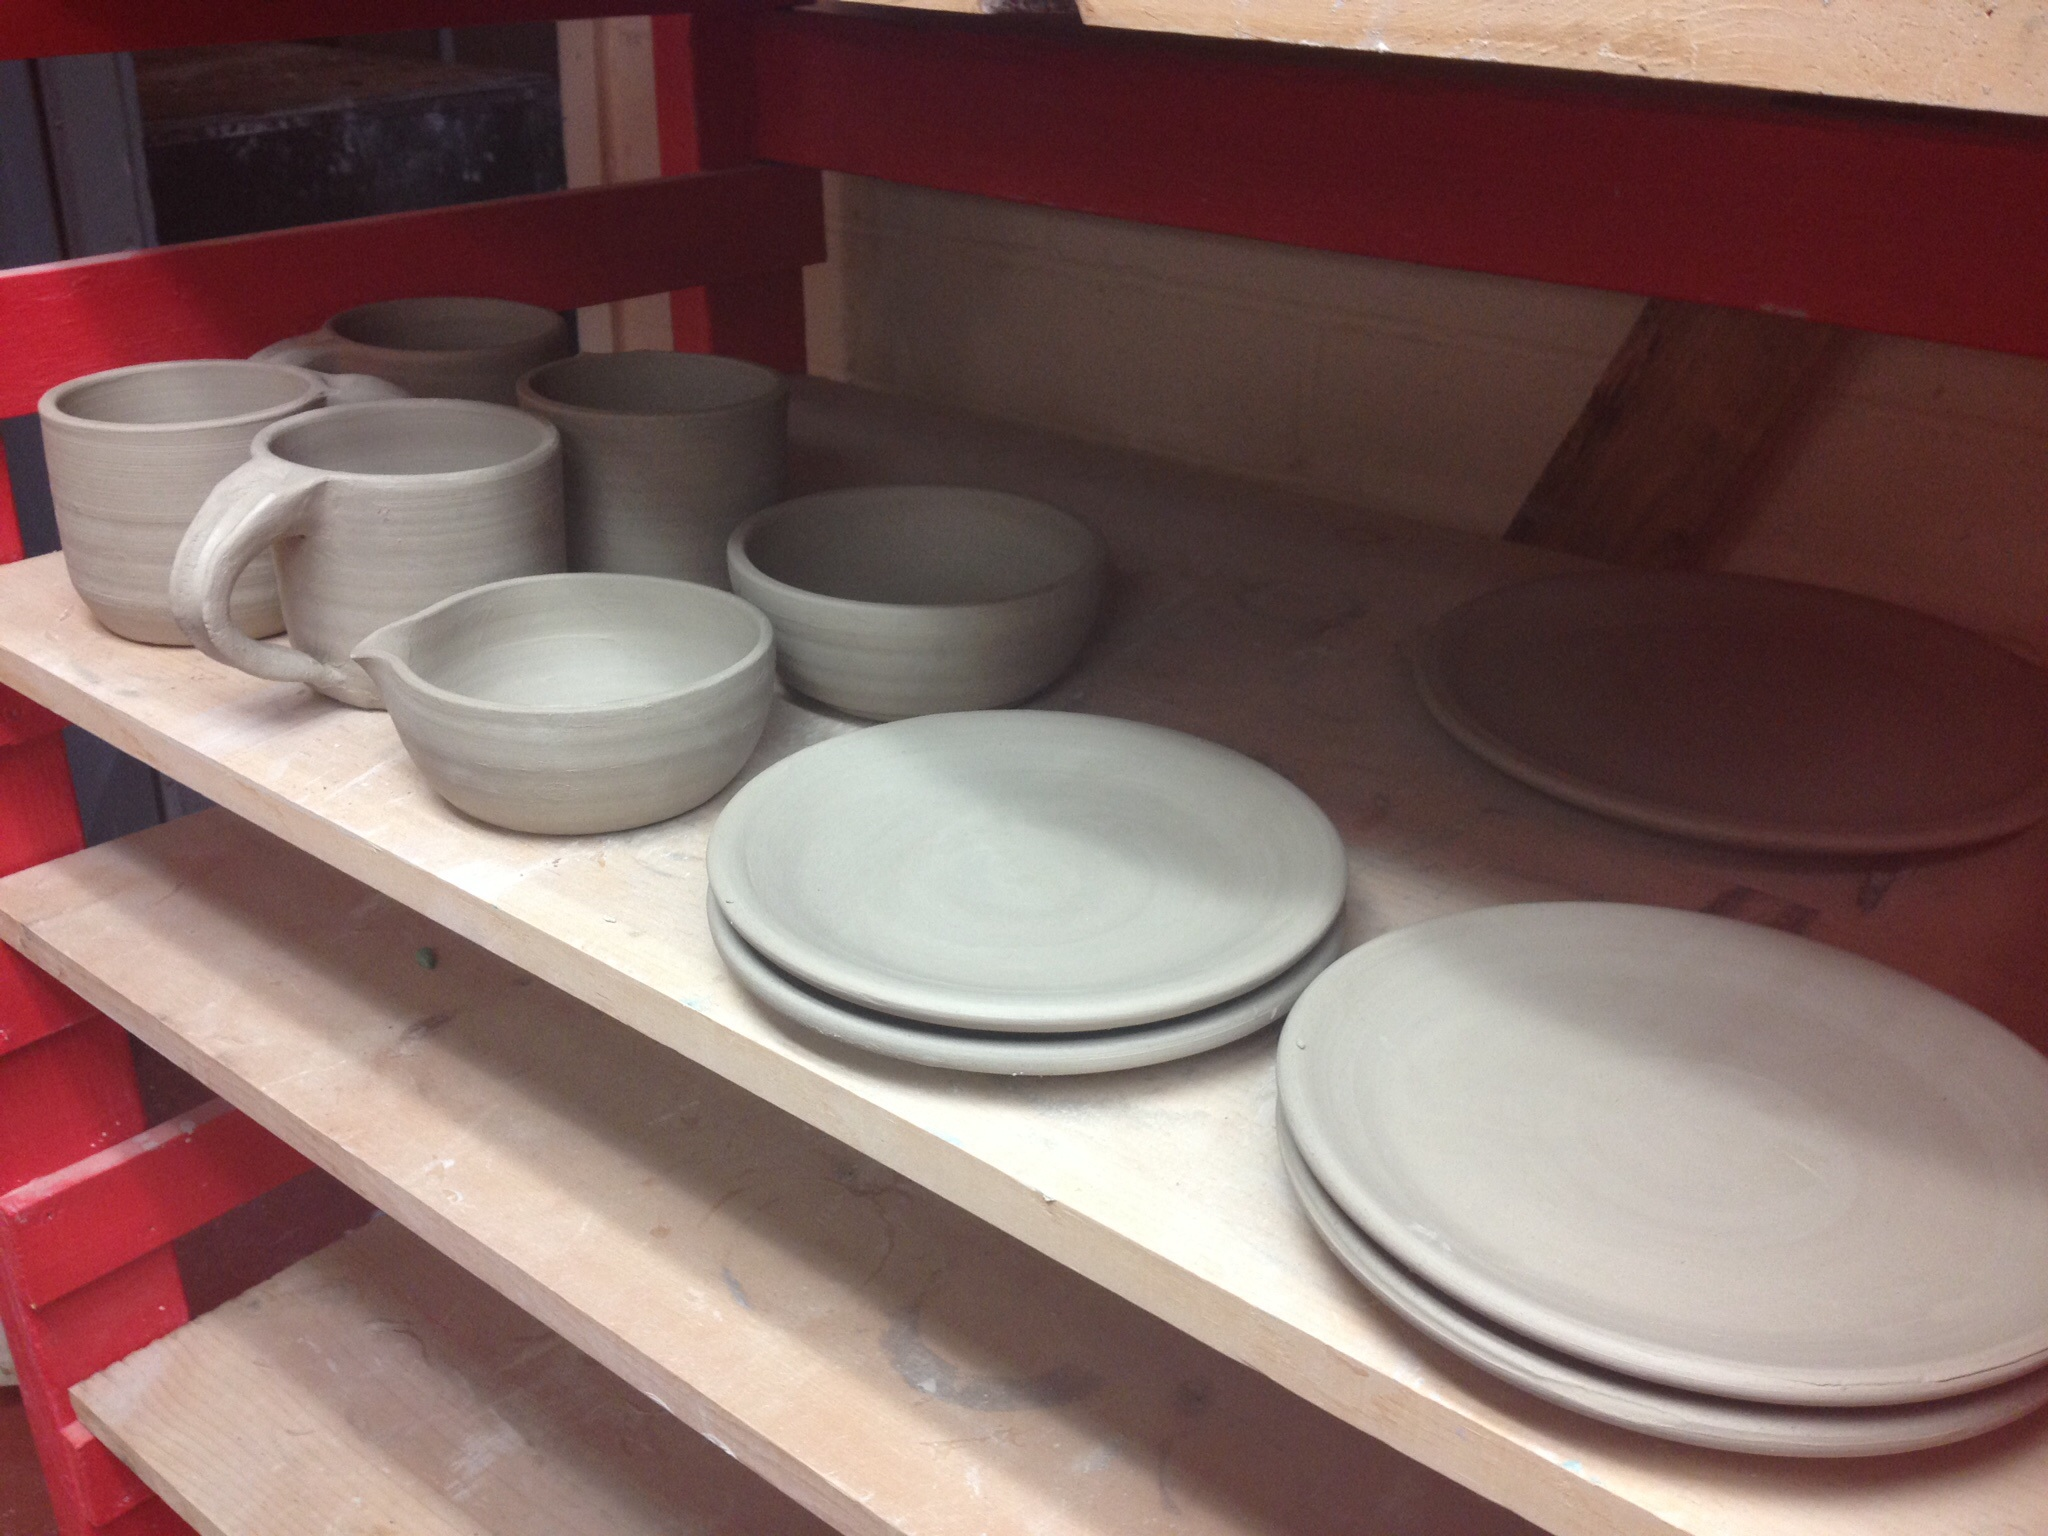 More Mugs, Plates Finished